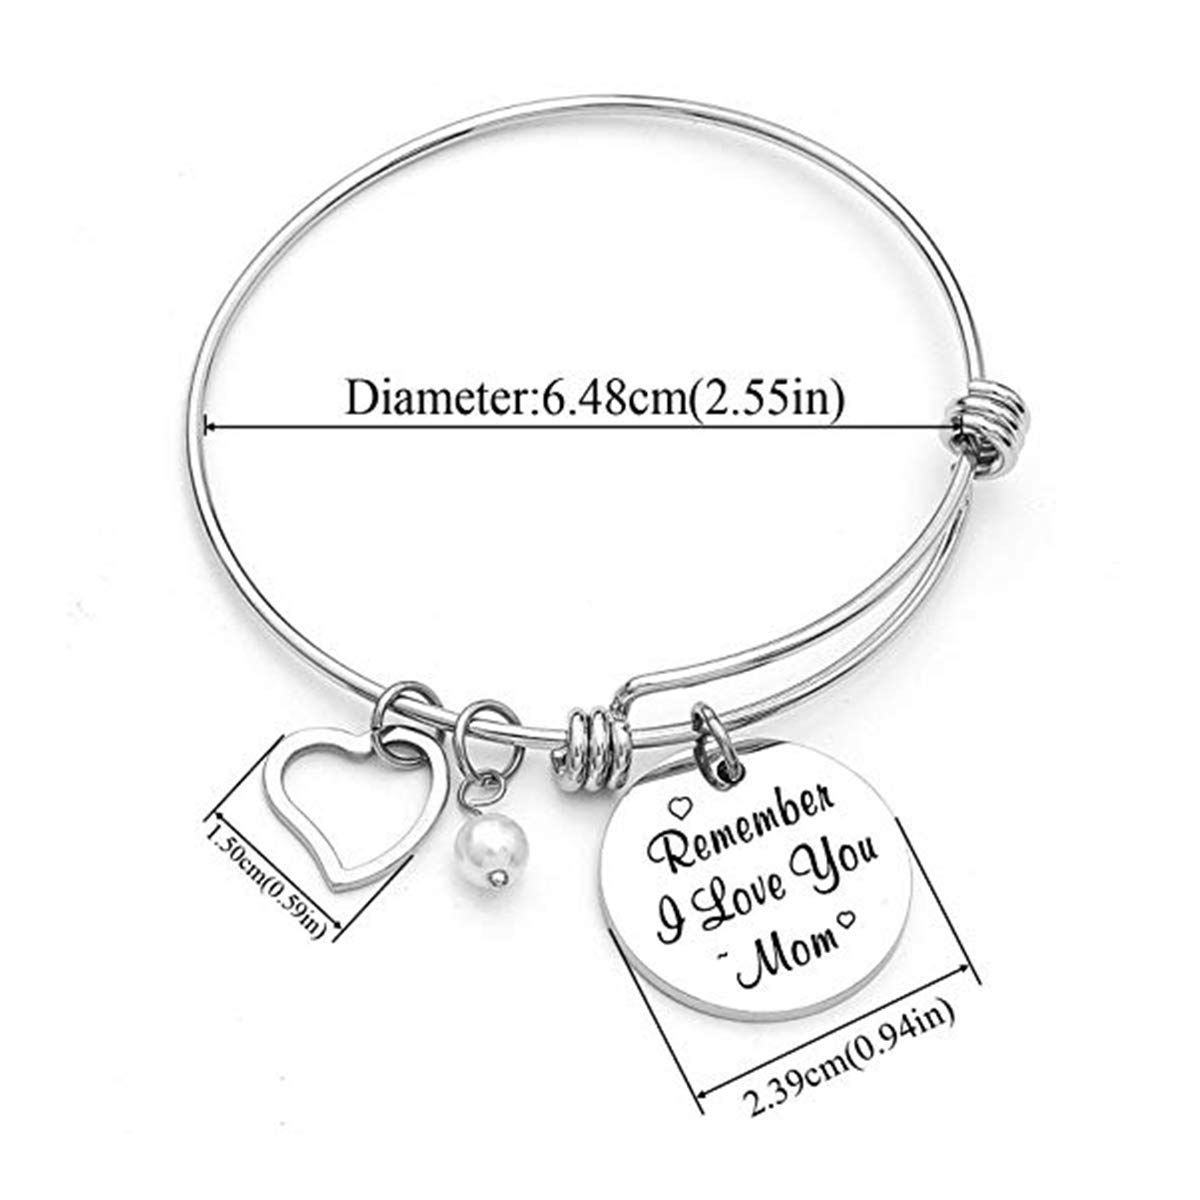 Vinca Mascot Charm Bracelet for Women Mom Remember I Love You Mom Stainless Steel Adjustable Bangle for Mother Birthday from Daughter Son